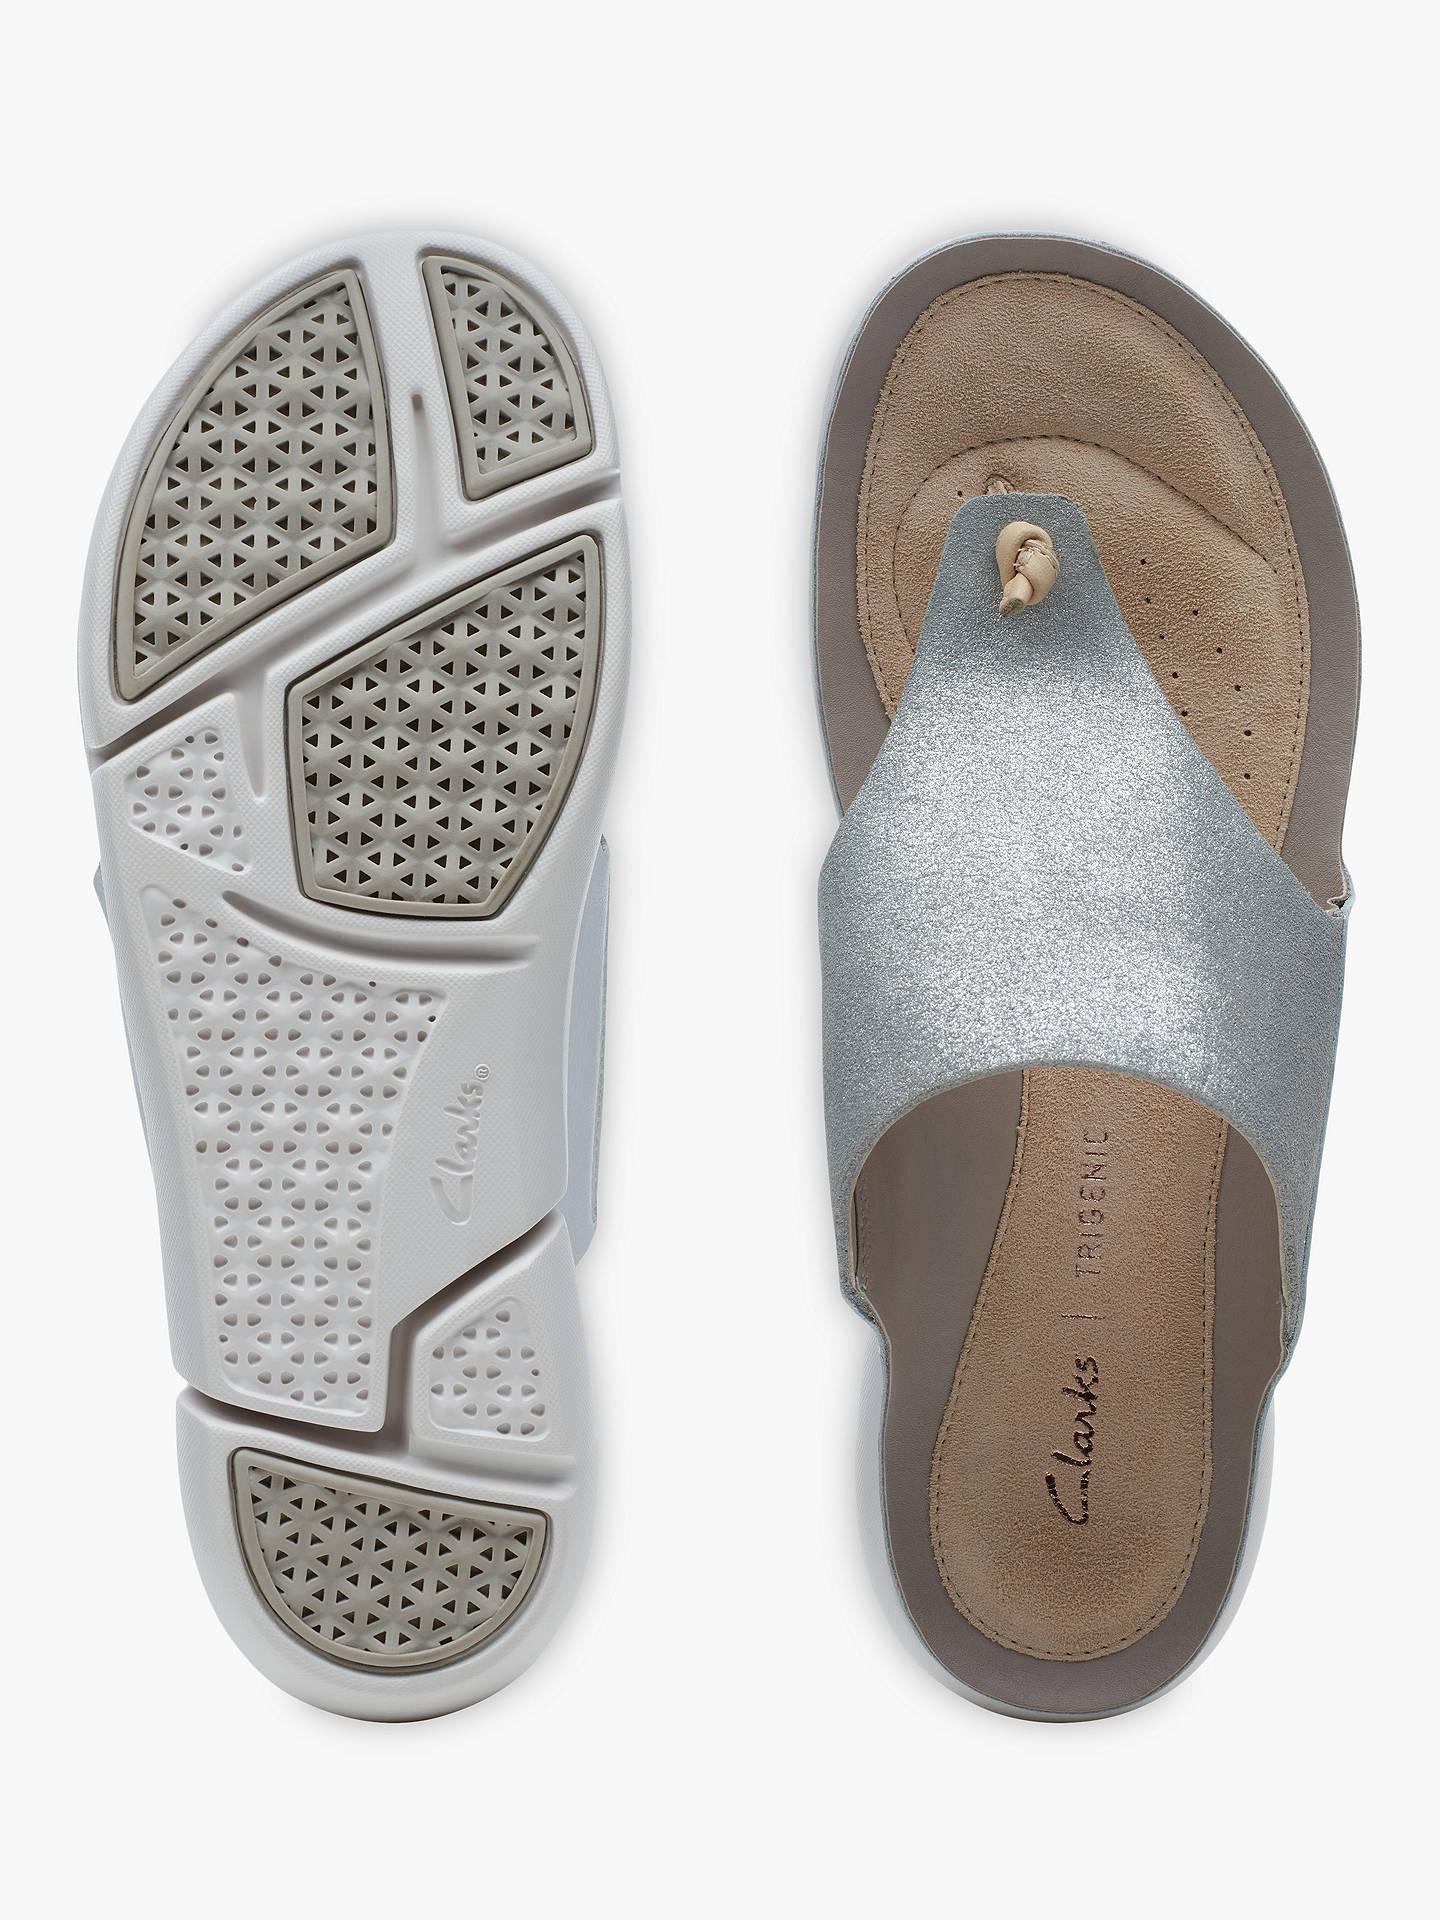 509e81deffbc Clarks Tri Carmen Toe Post Sandals at John Lewis   Partners